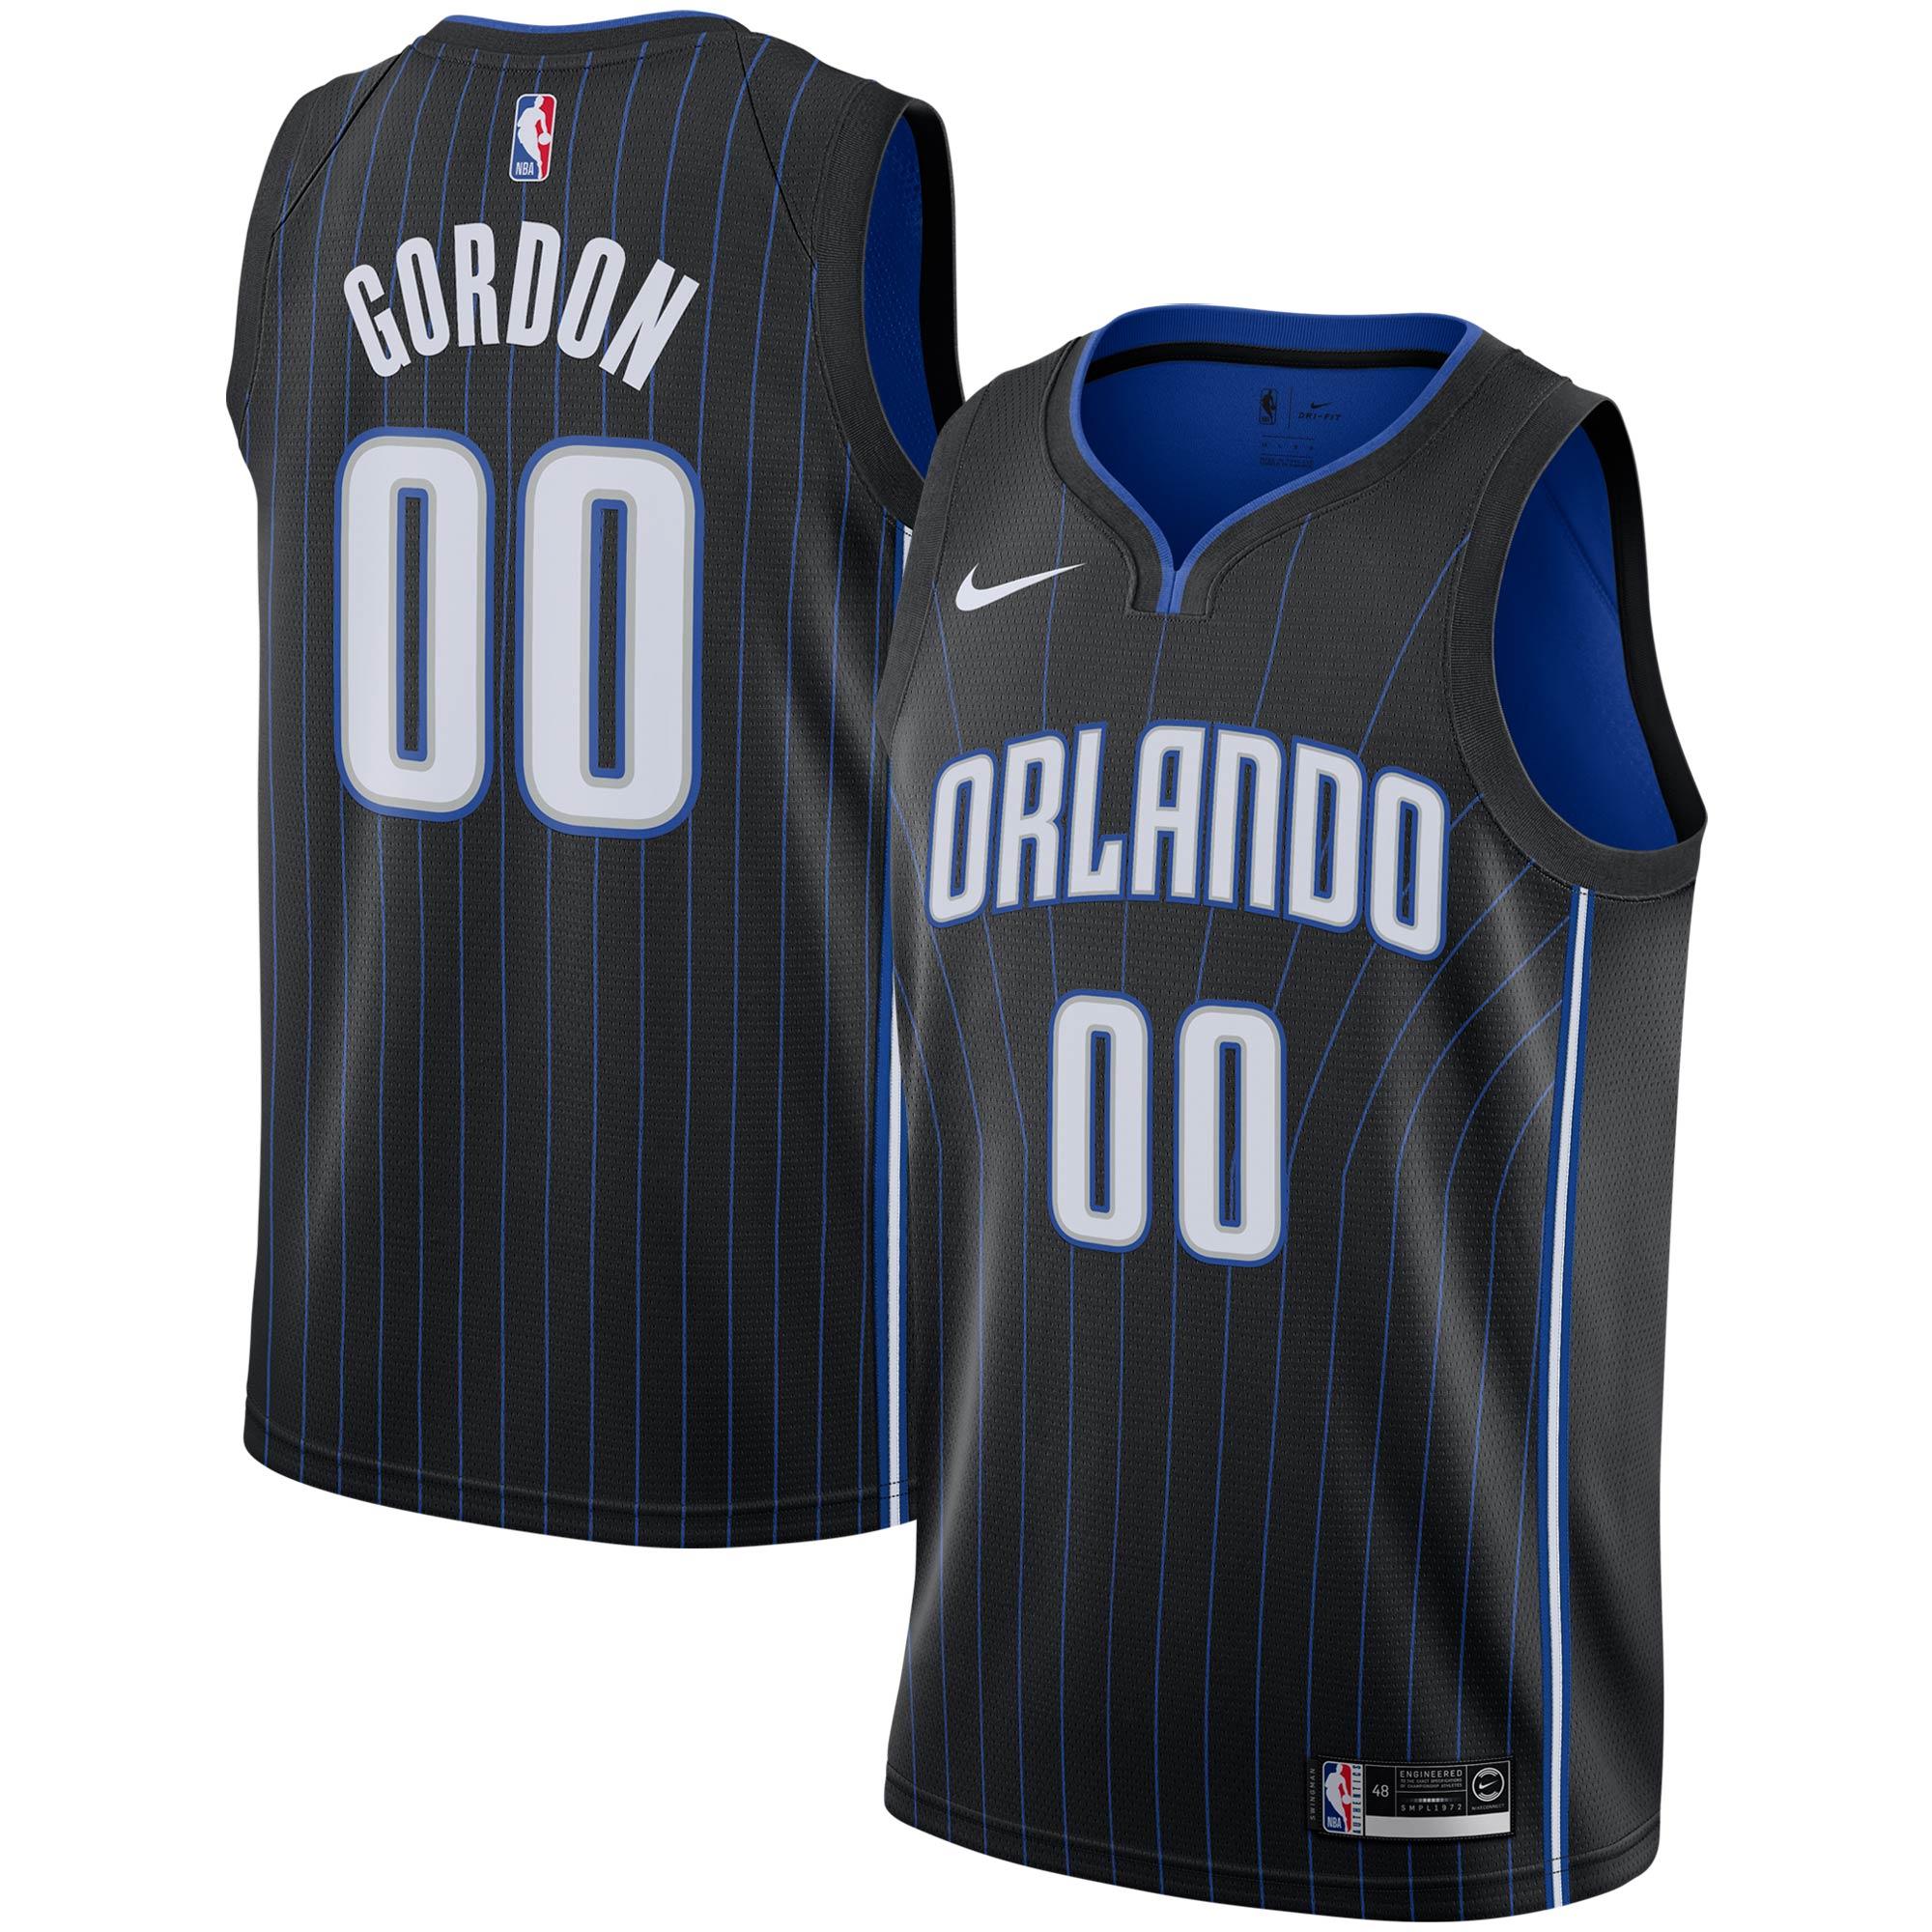 Aaron Gordon Orlando Magic Nike 2019/2020 Swingman Jersey - Icon Edition - Black